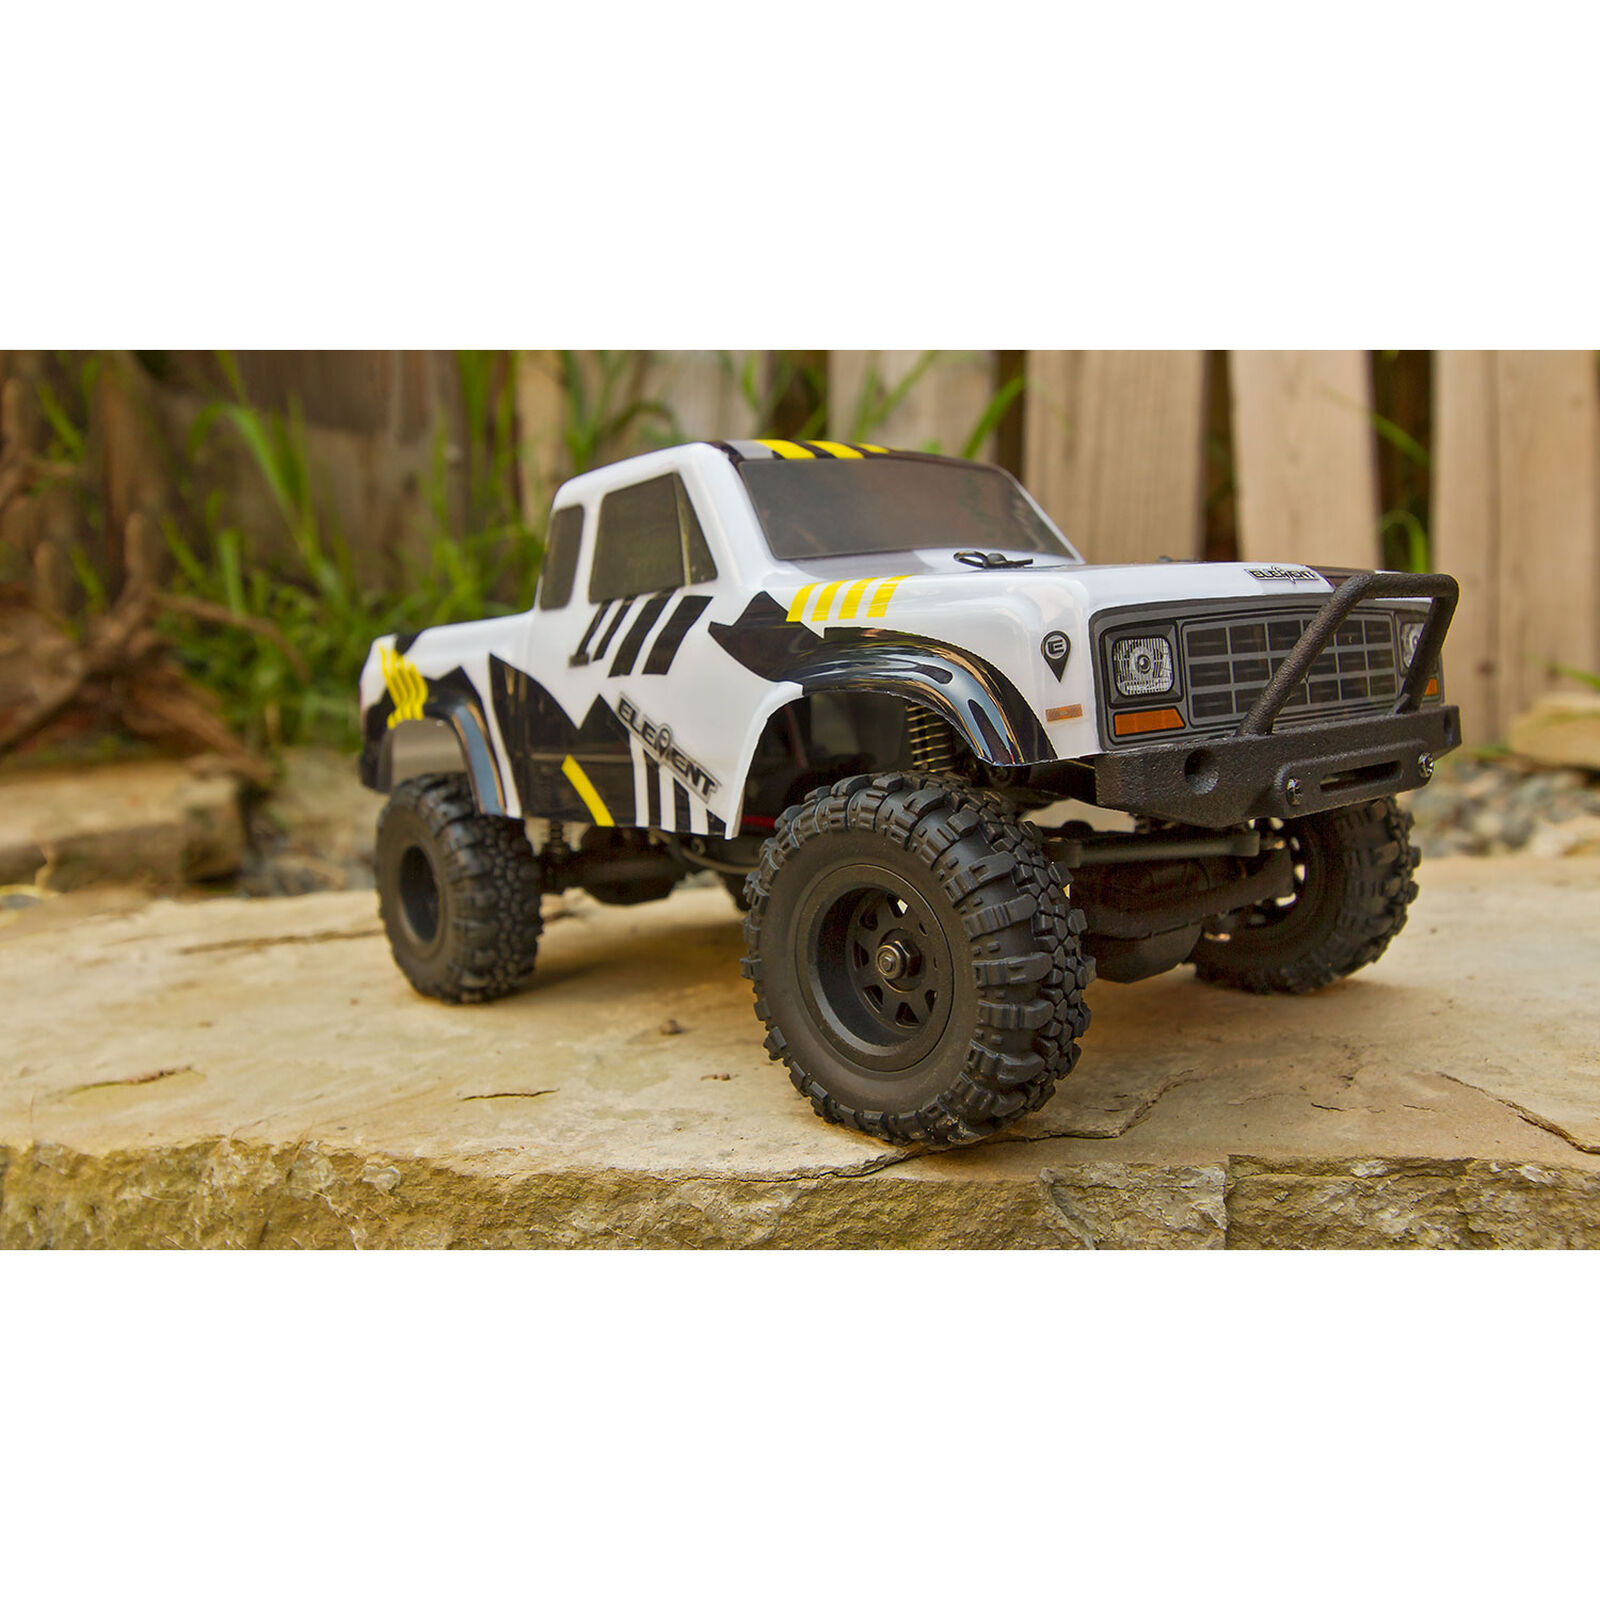 1/24 Enduro24 Sendero Trail Truck RTR, Black/Yellow